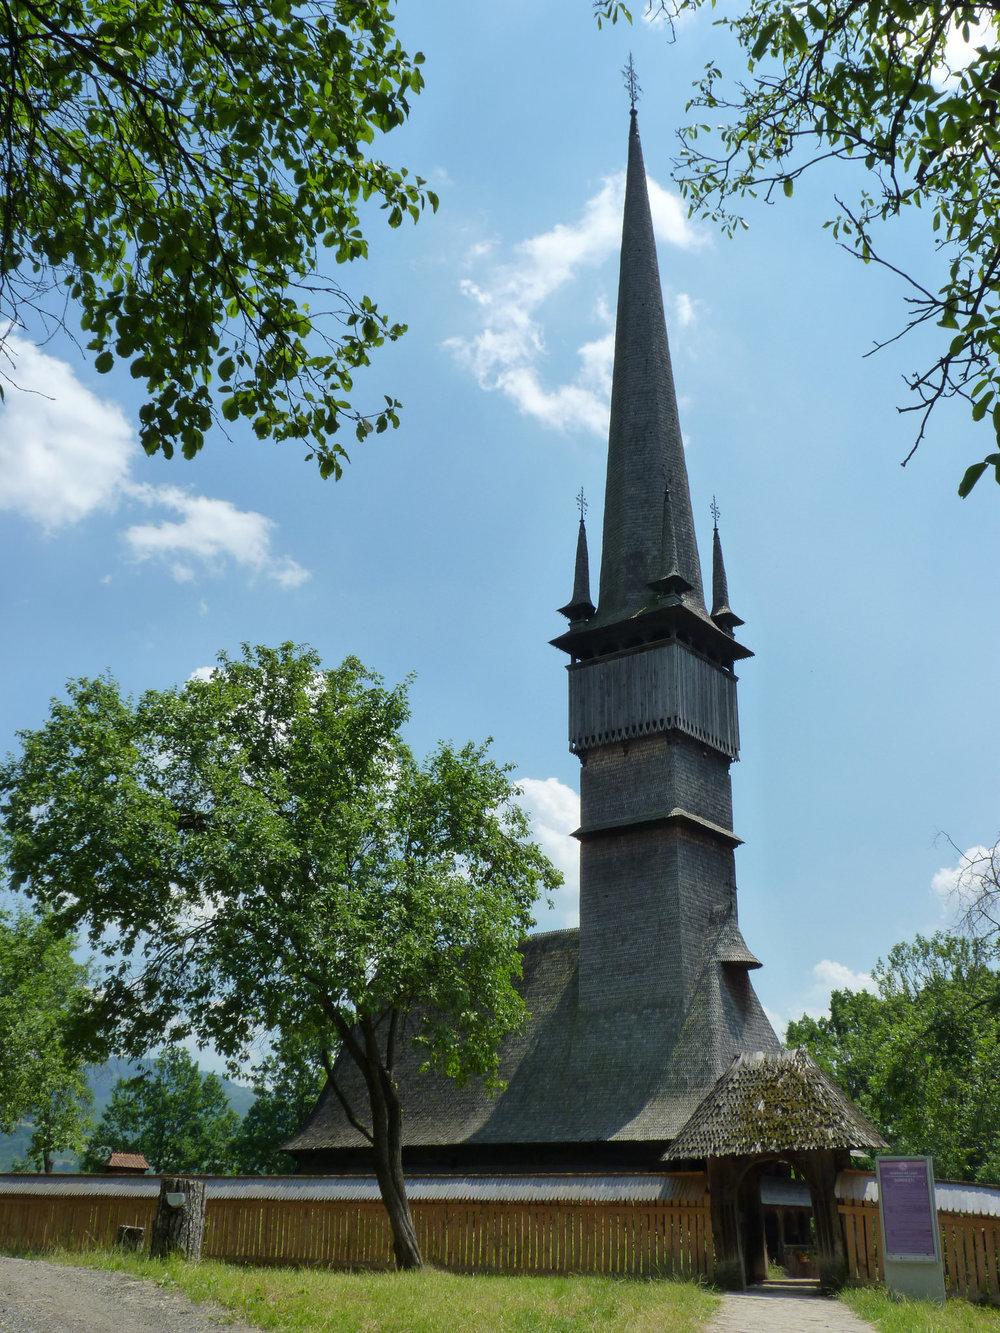 The Wooden Church of Surdesti (copyright: creative commons)